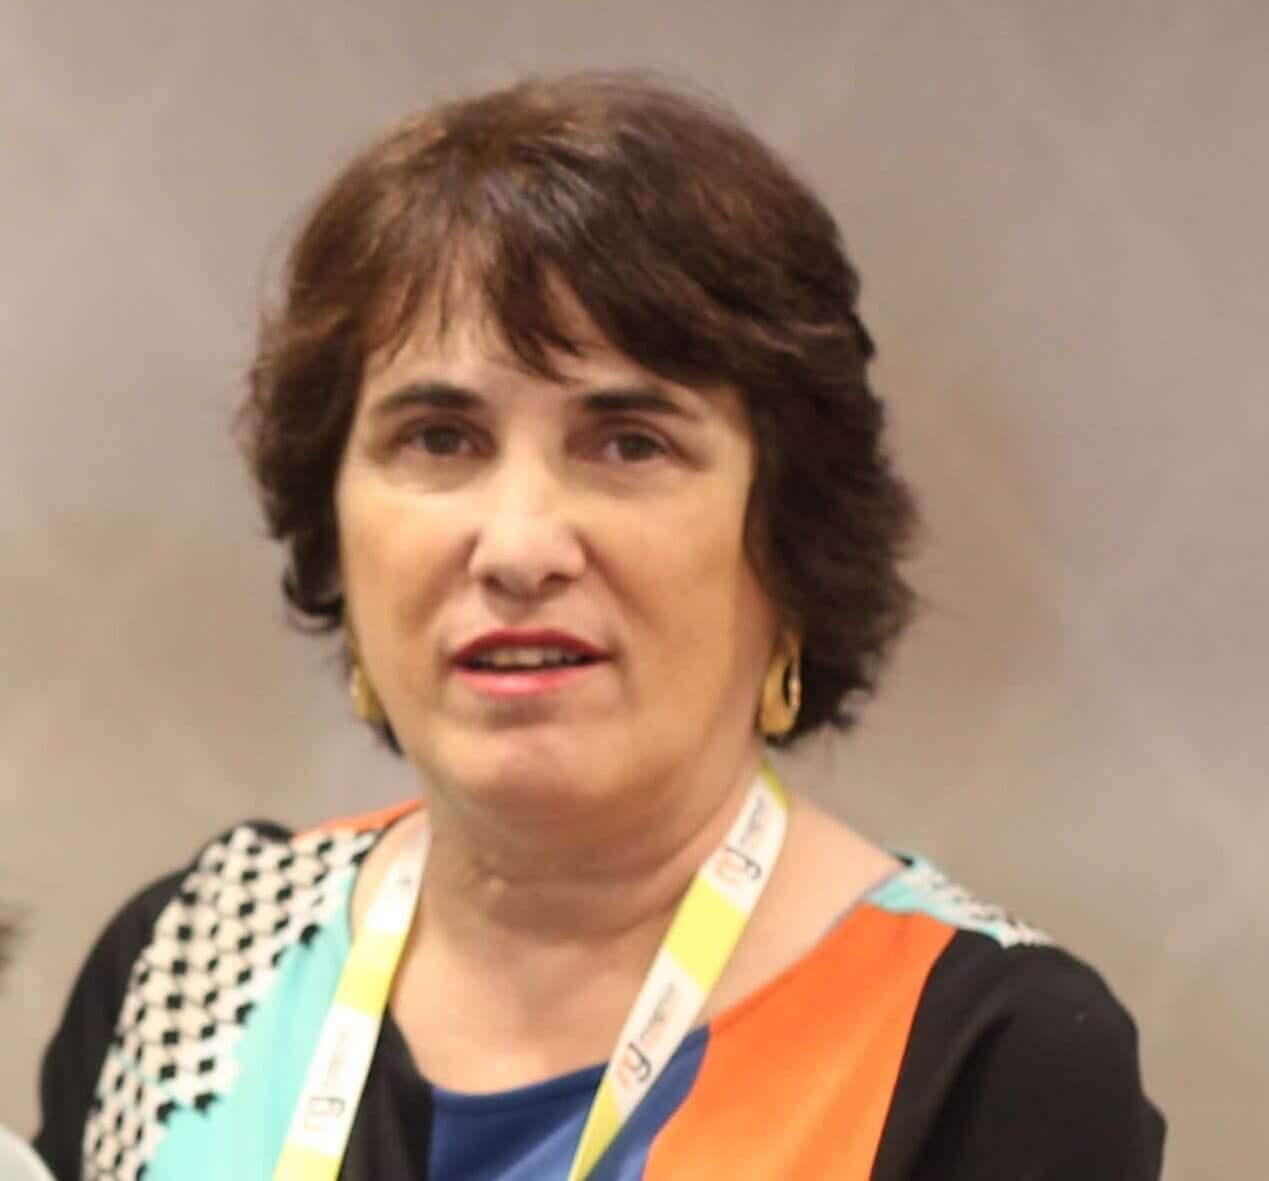 Speaker at upcoming Nursing conferences- Daryle Wane